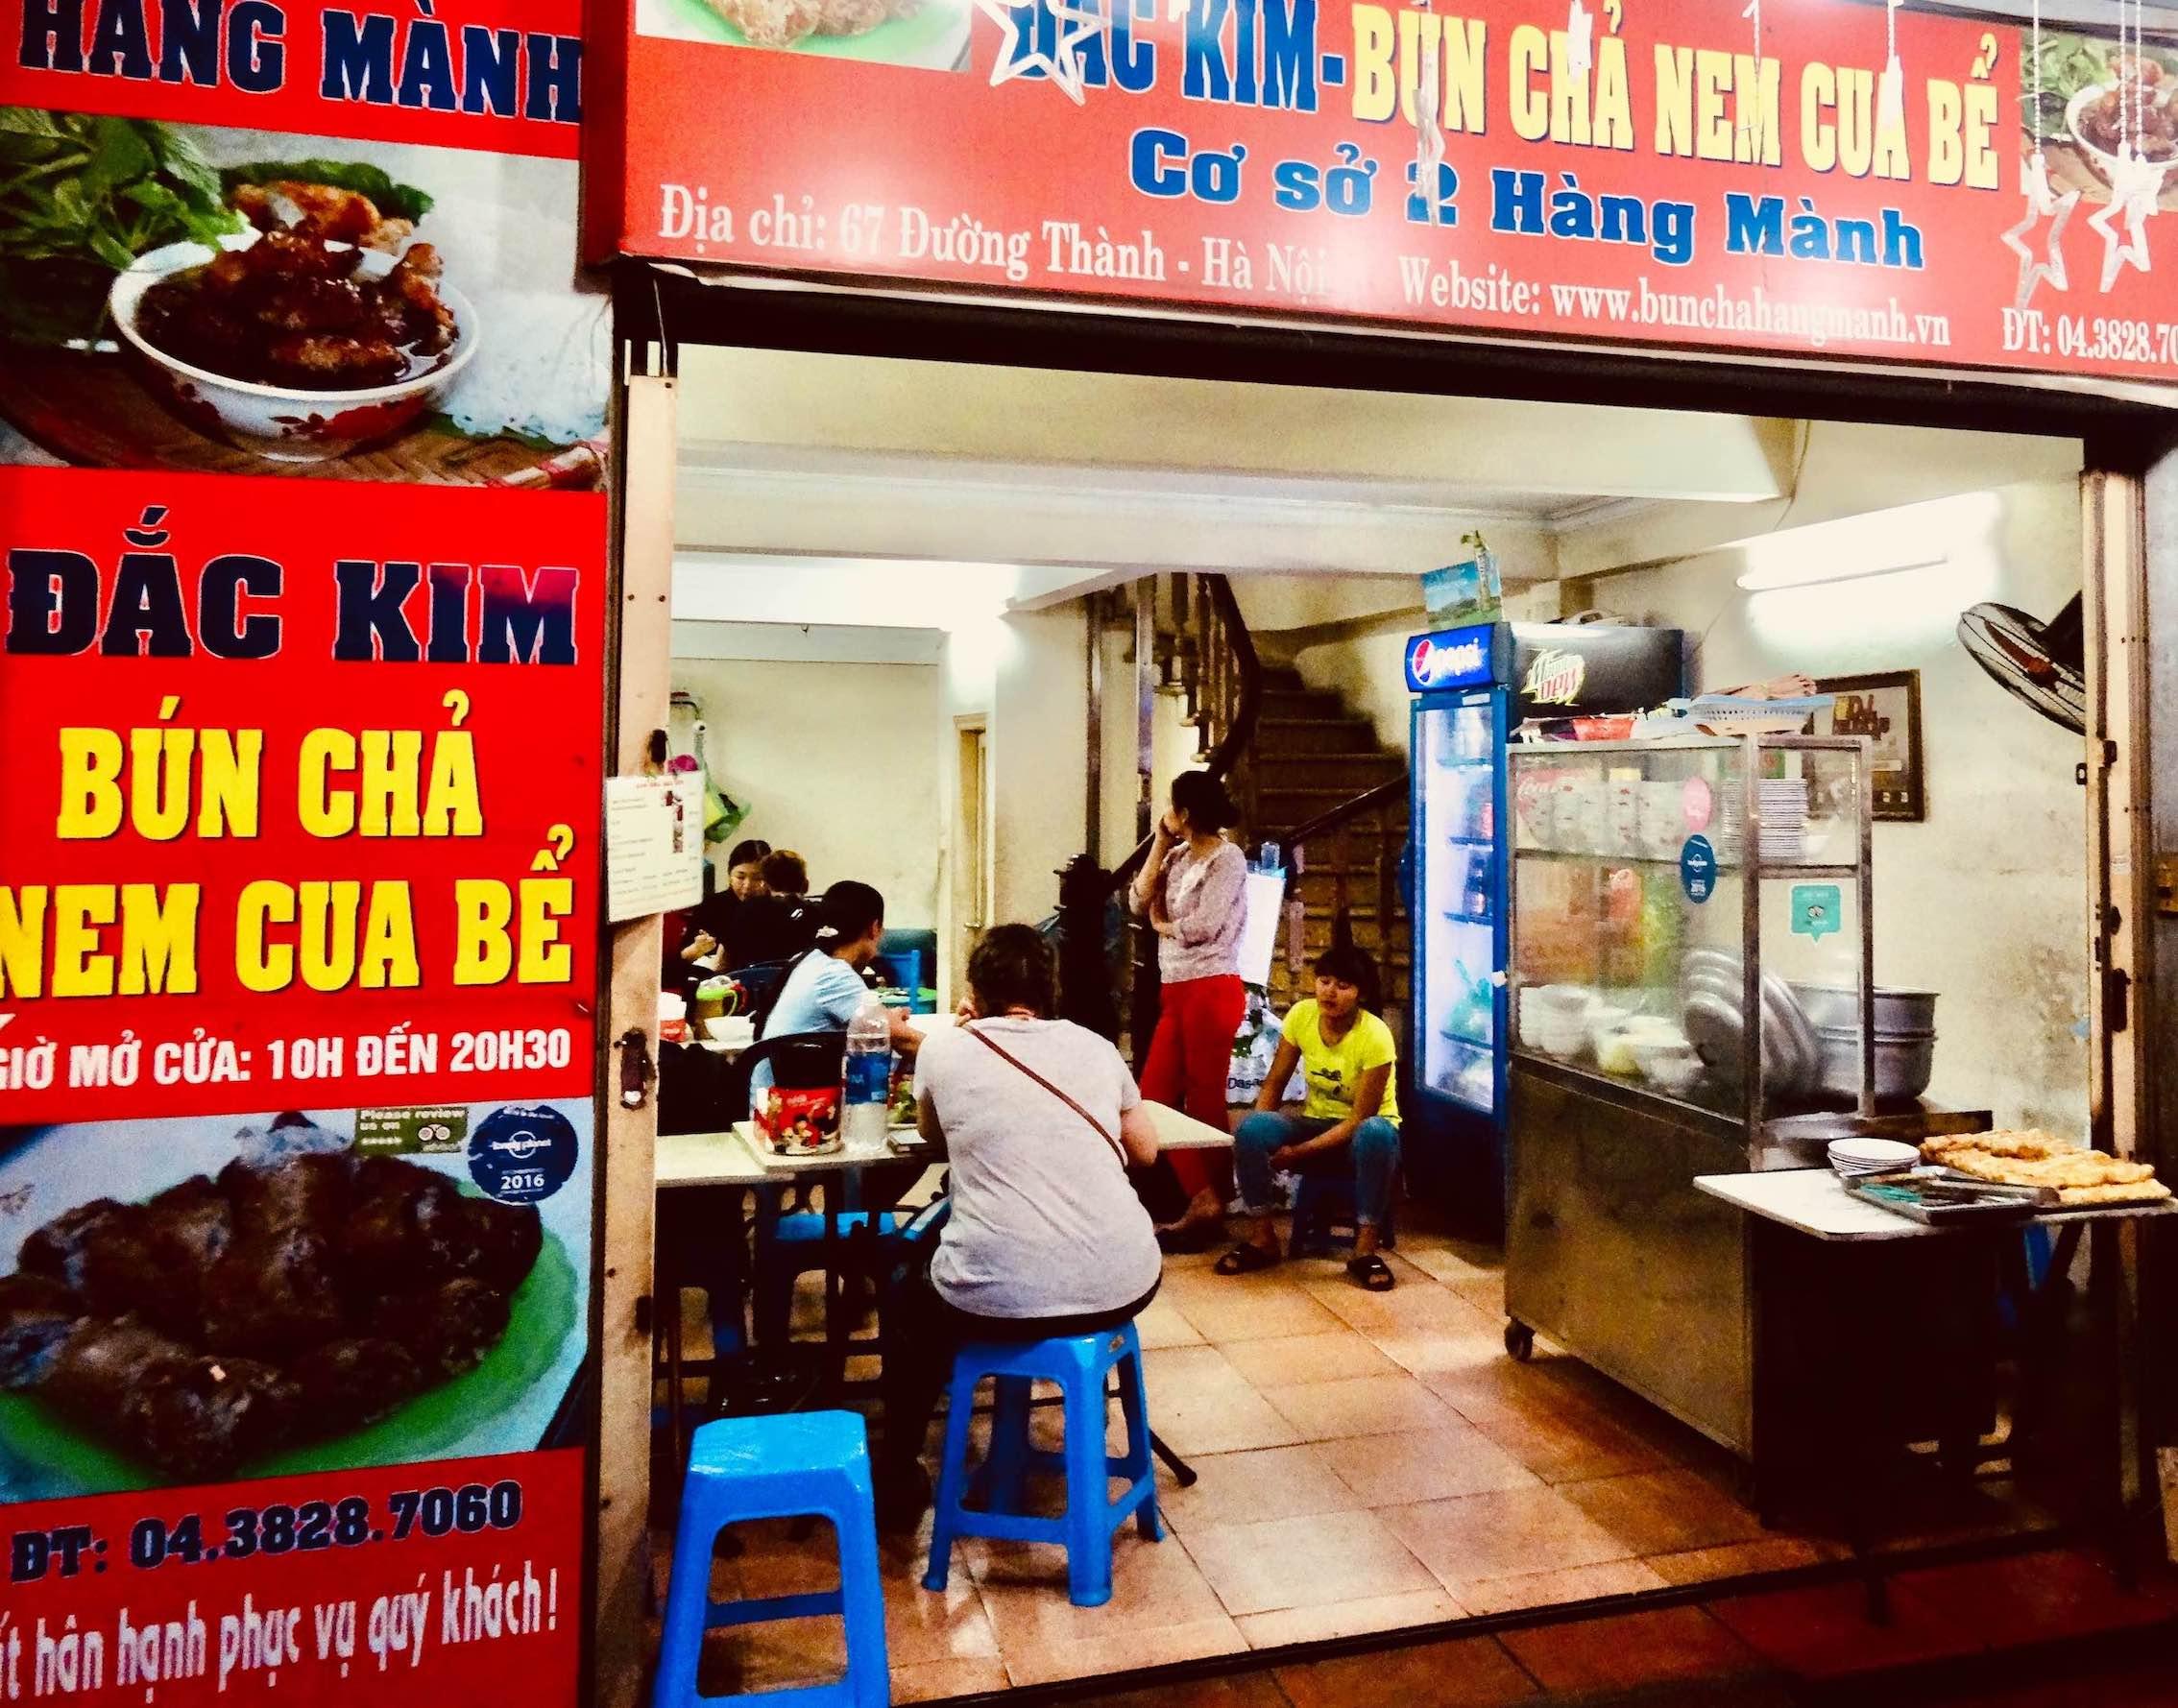 Bun Cha Nem Cua Be Dac Kim in Hanoi